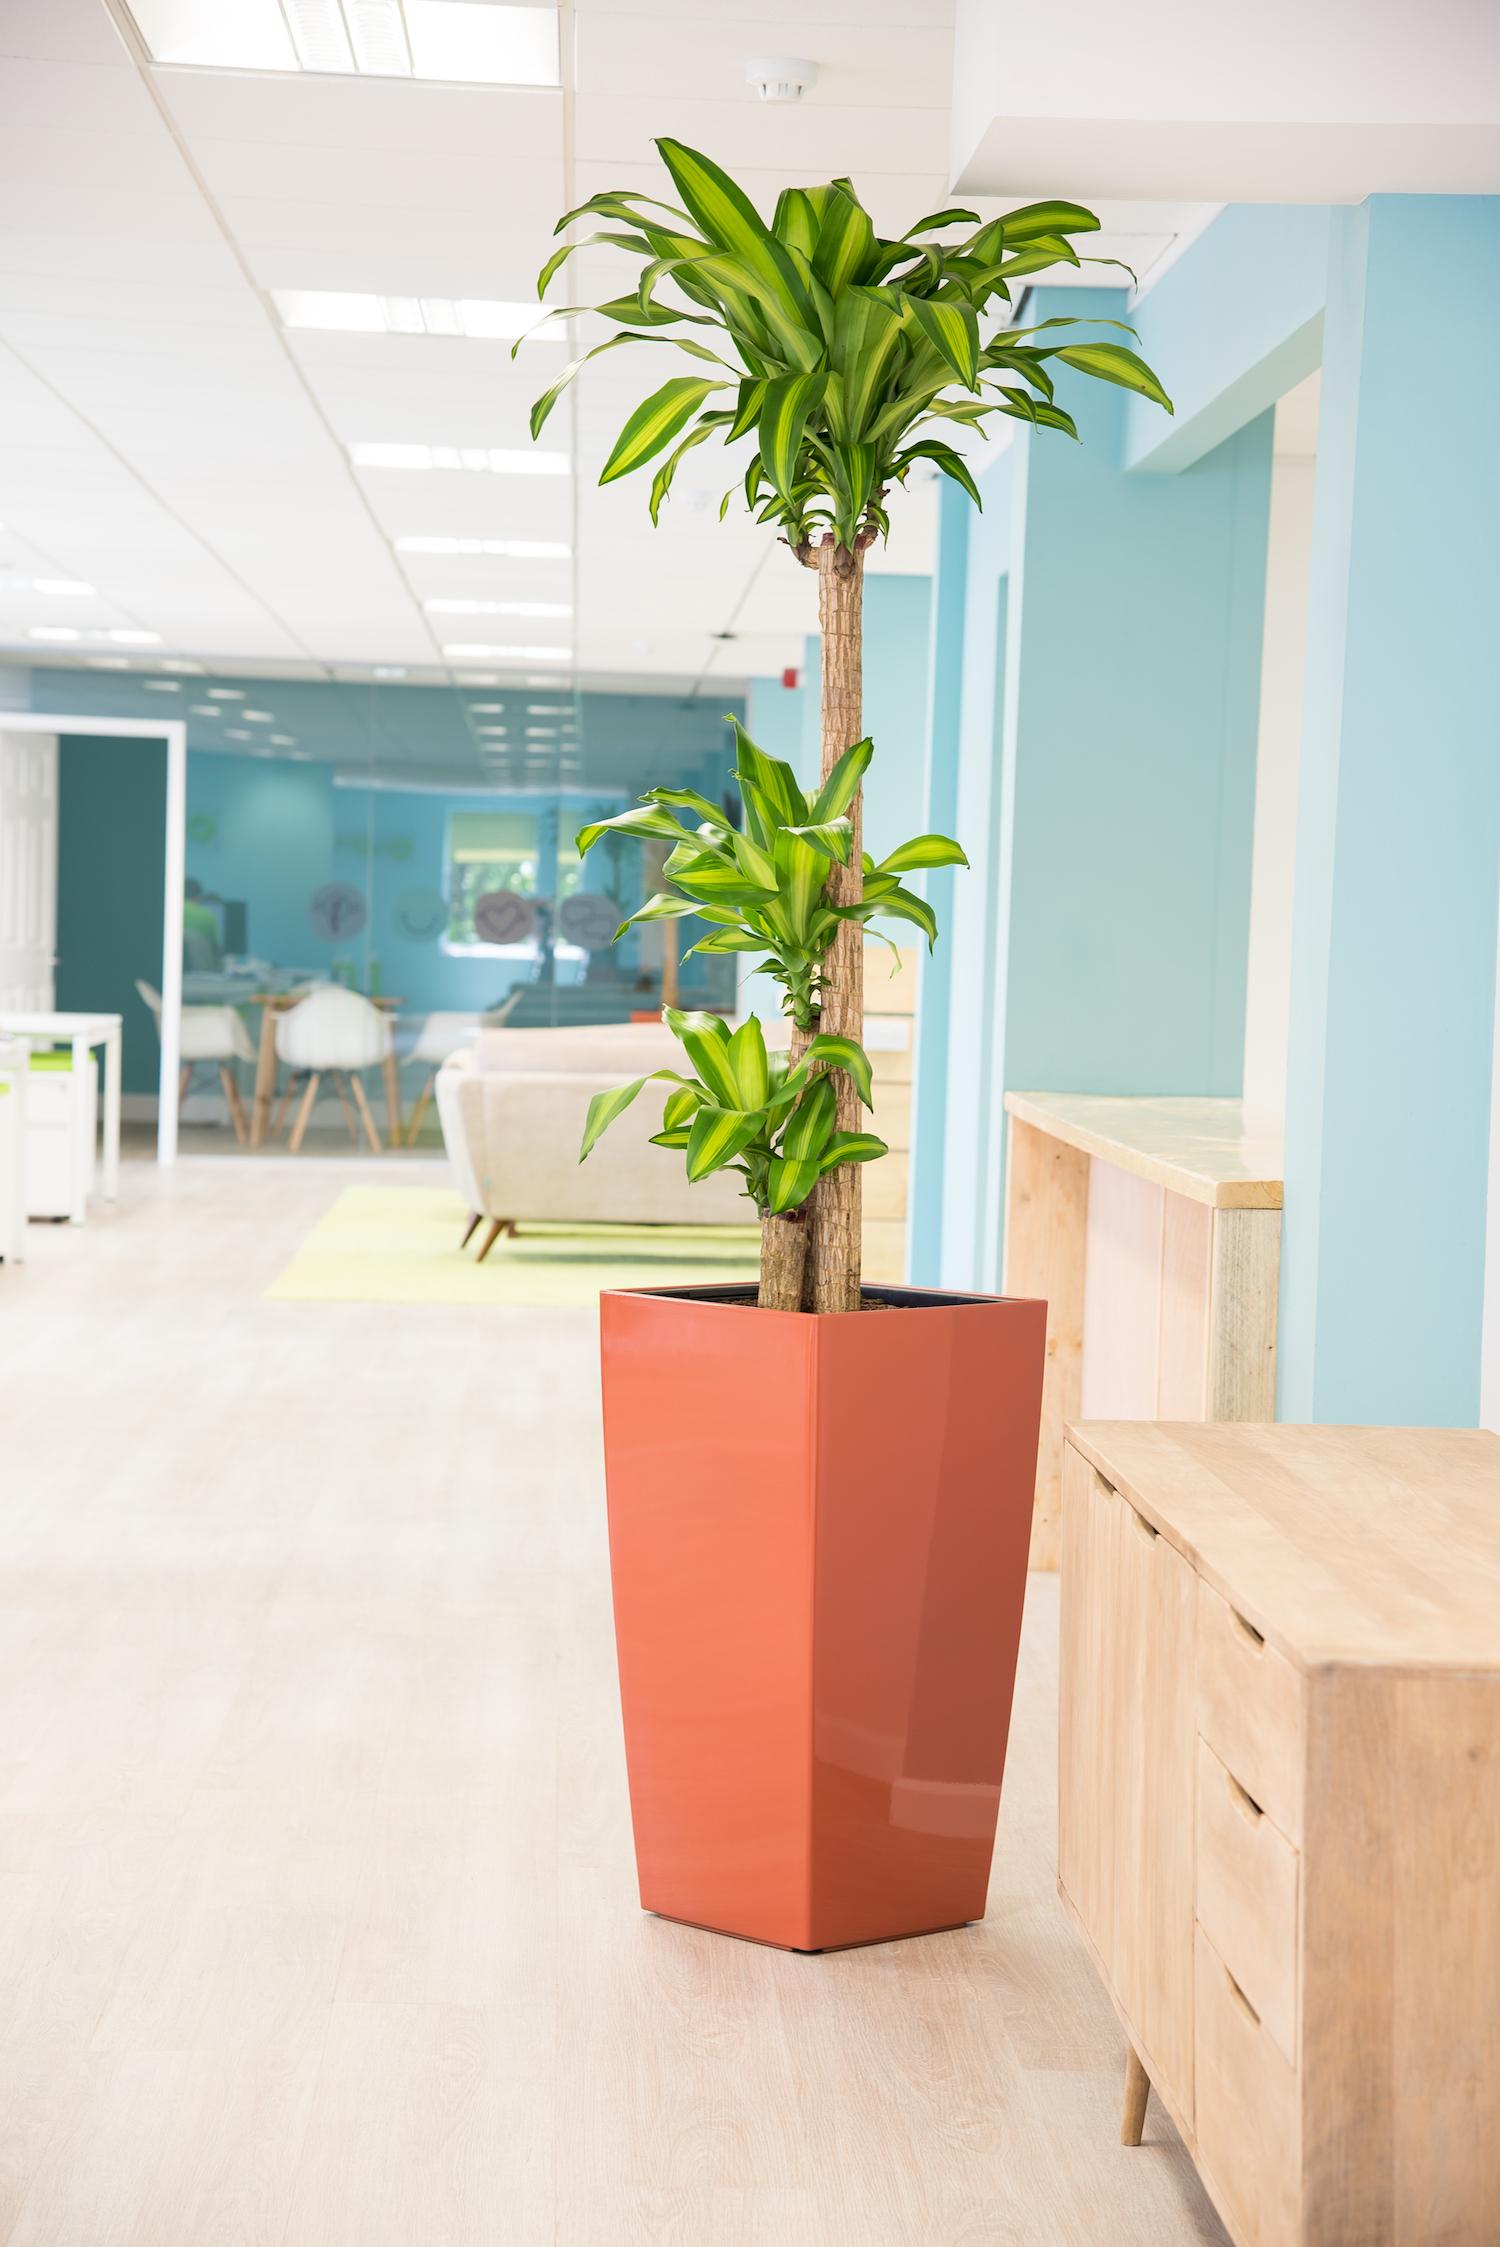 forrestbrown-plantcare-interior-plants-trees-bristol-image-1